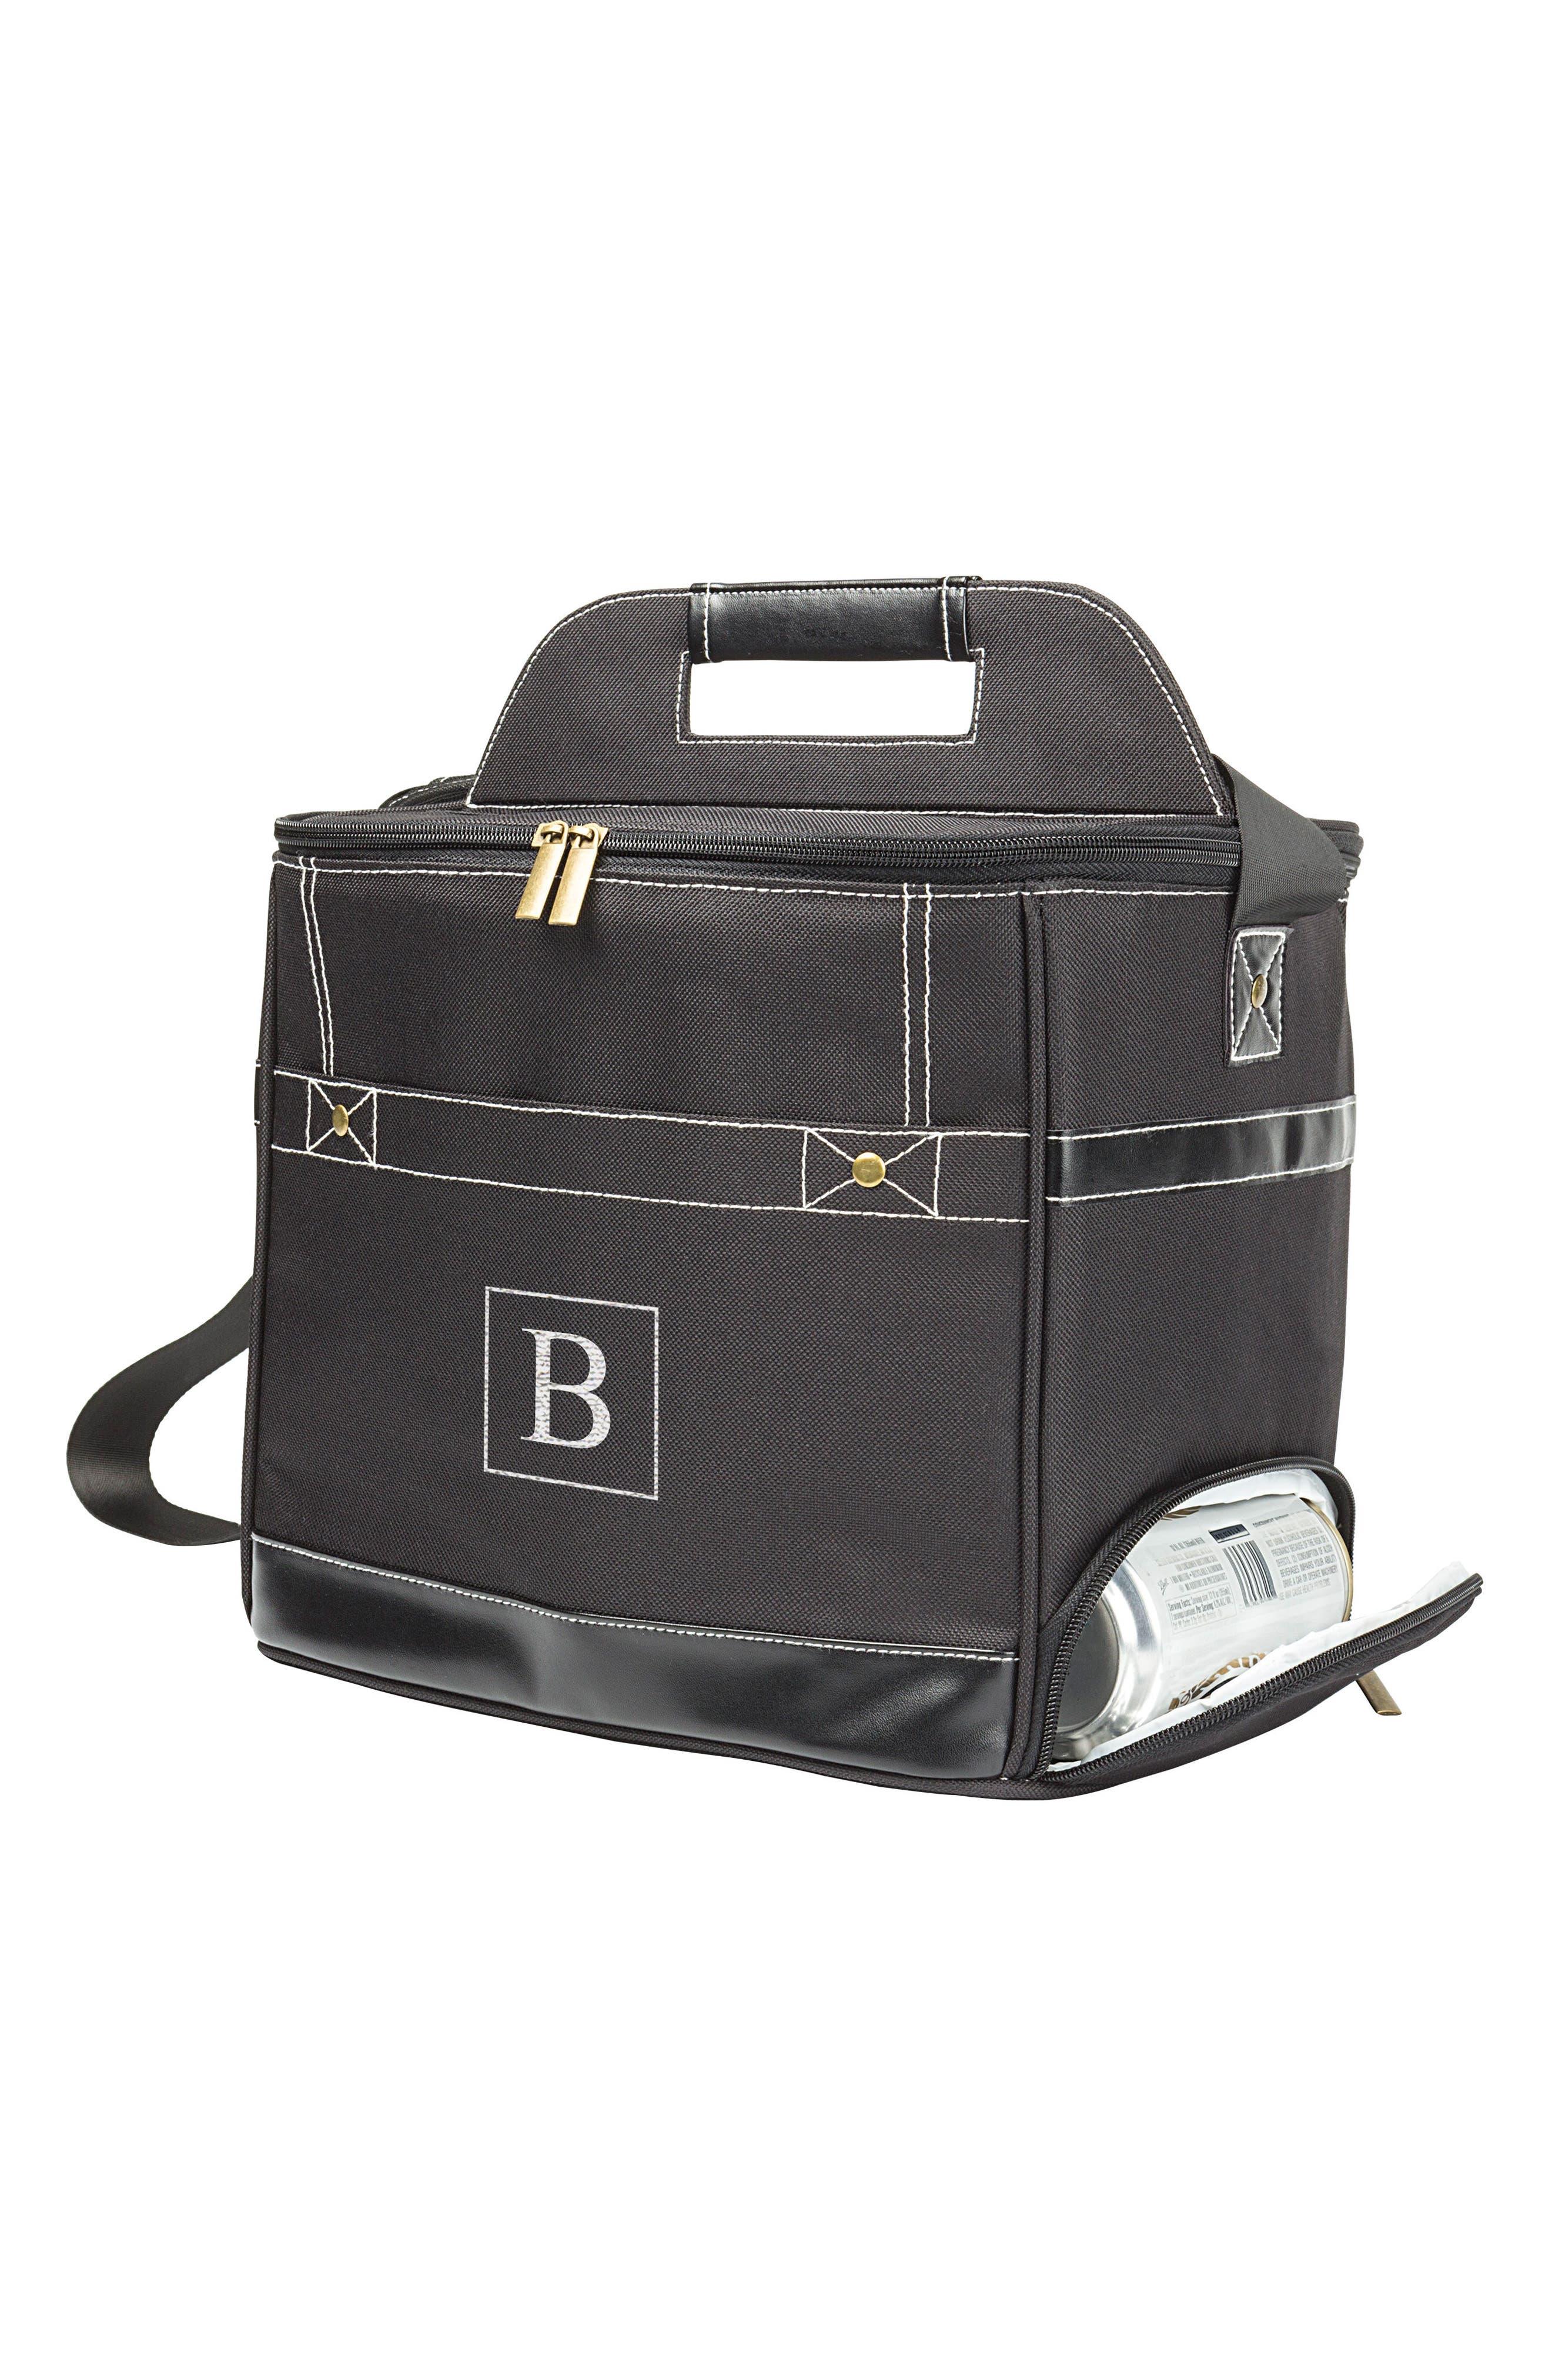 Monogram Can Dispenser Cooler,                         Main,                         color, Black - B